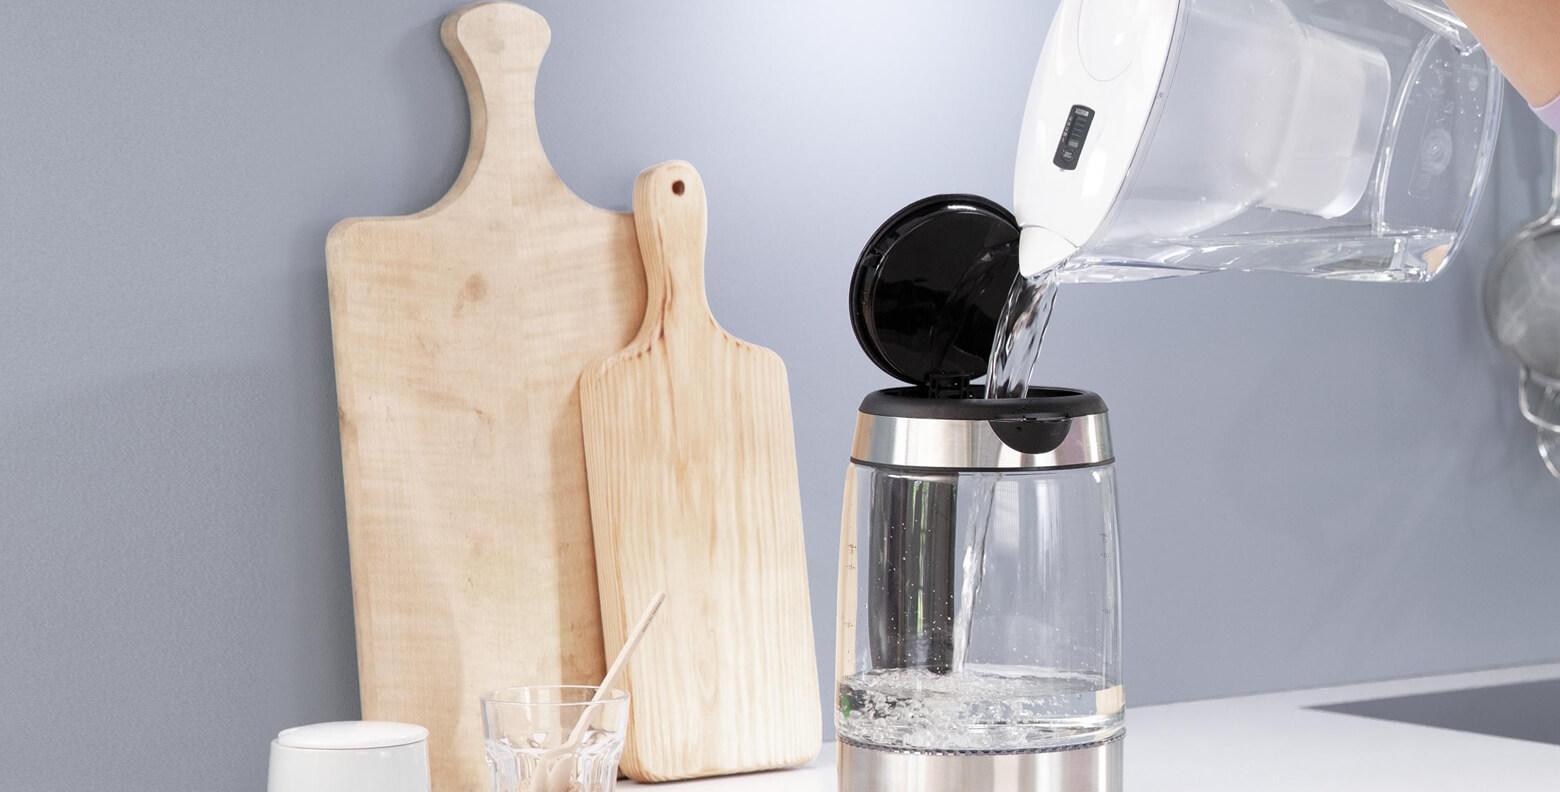 BRITA water filter reduce limescale